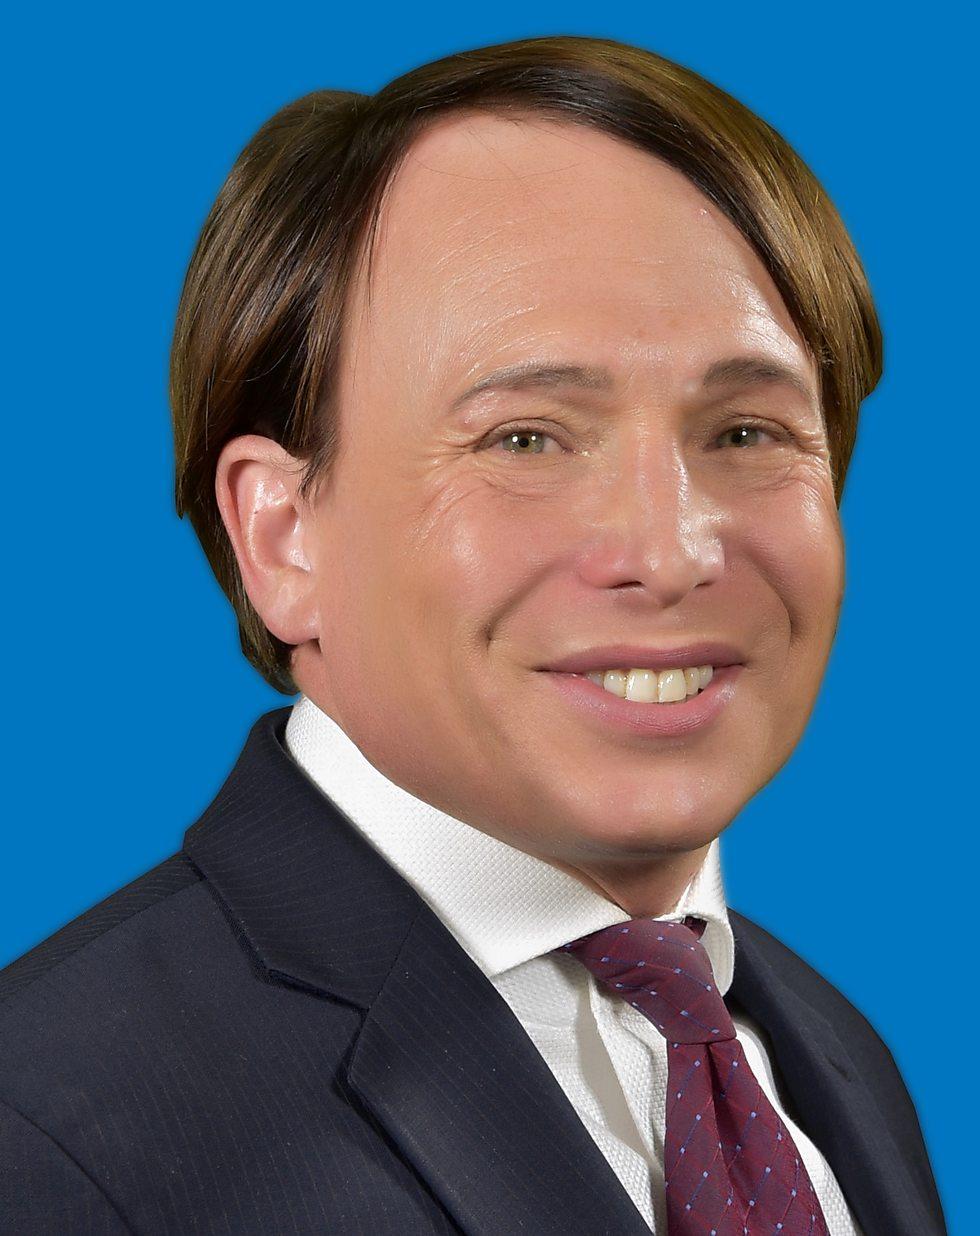 Shep Englander, the CEO of the Jewish Federation of Cincinnati